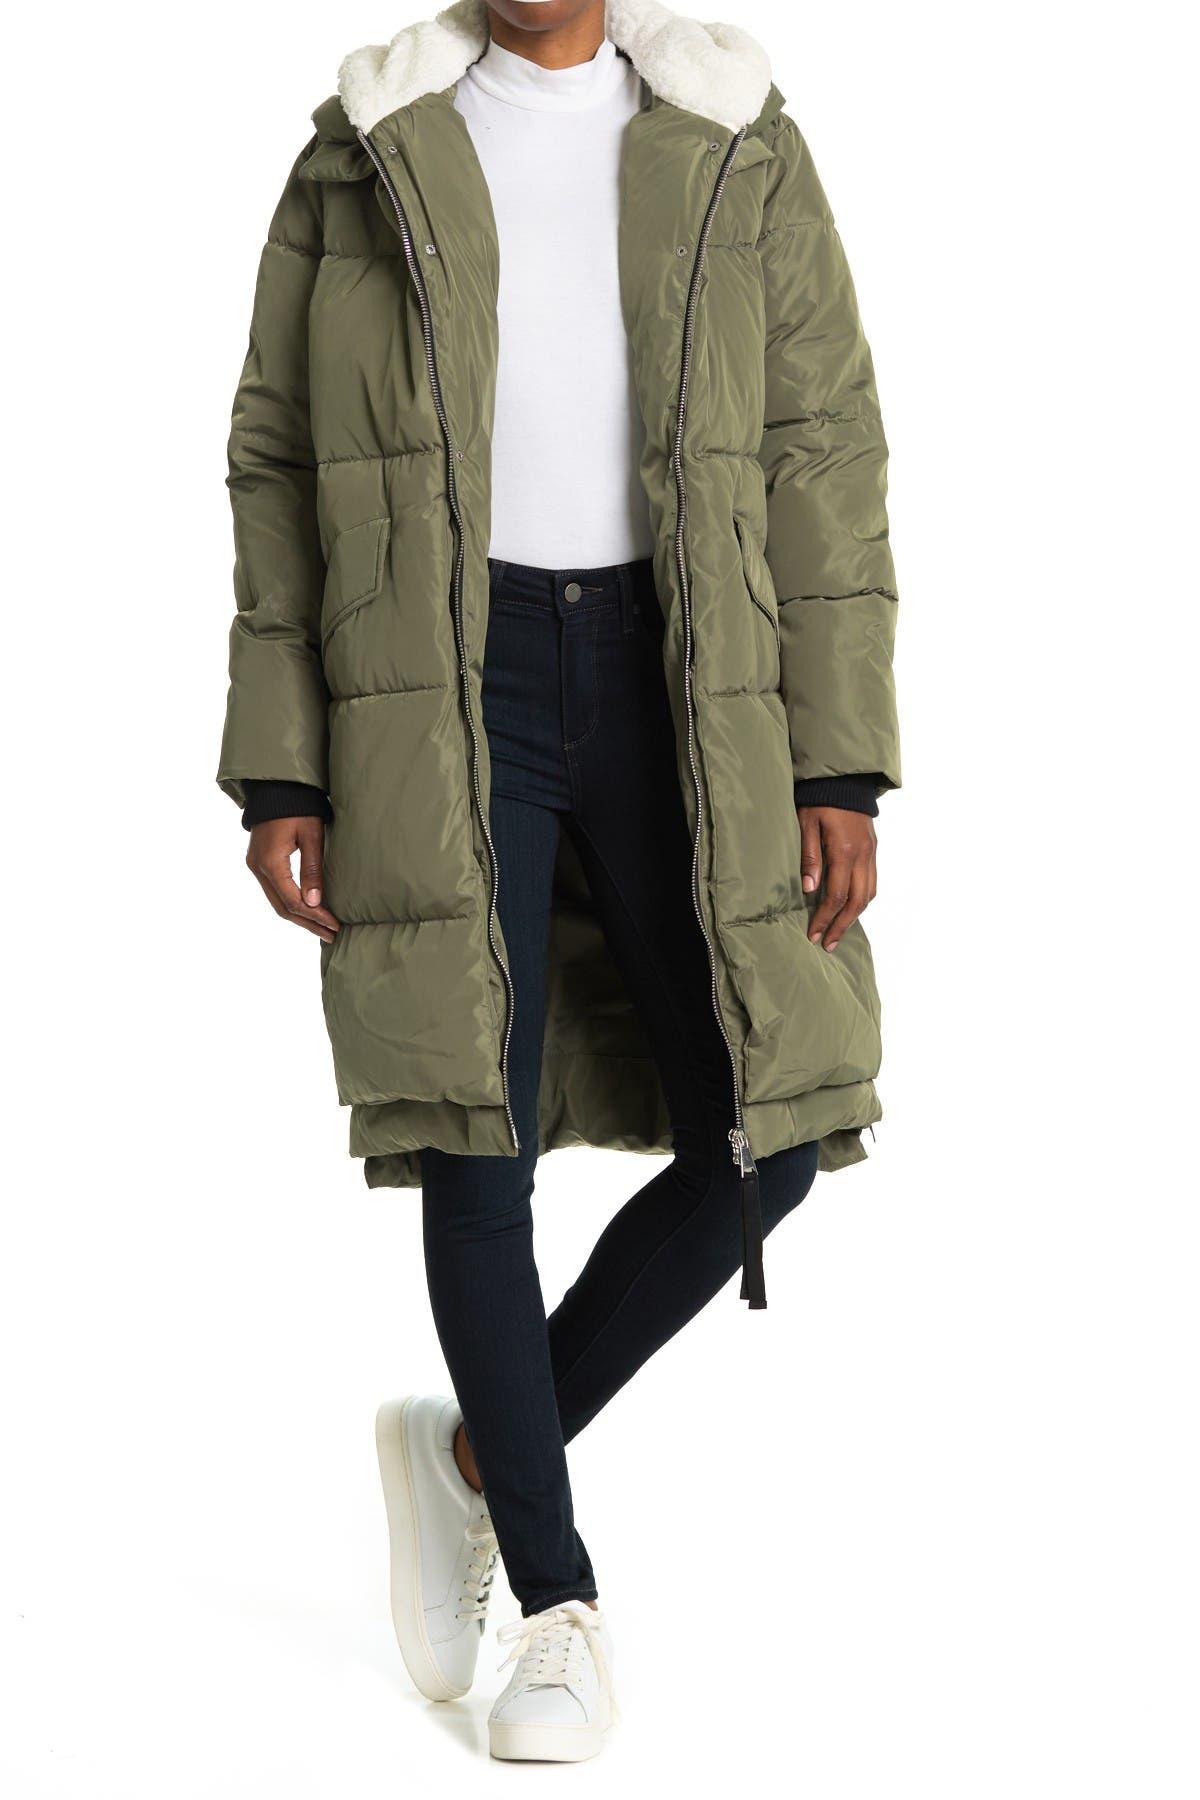 Image of Bagatelle Faux Shearling Long Parka Jacket